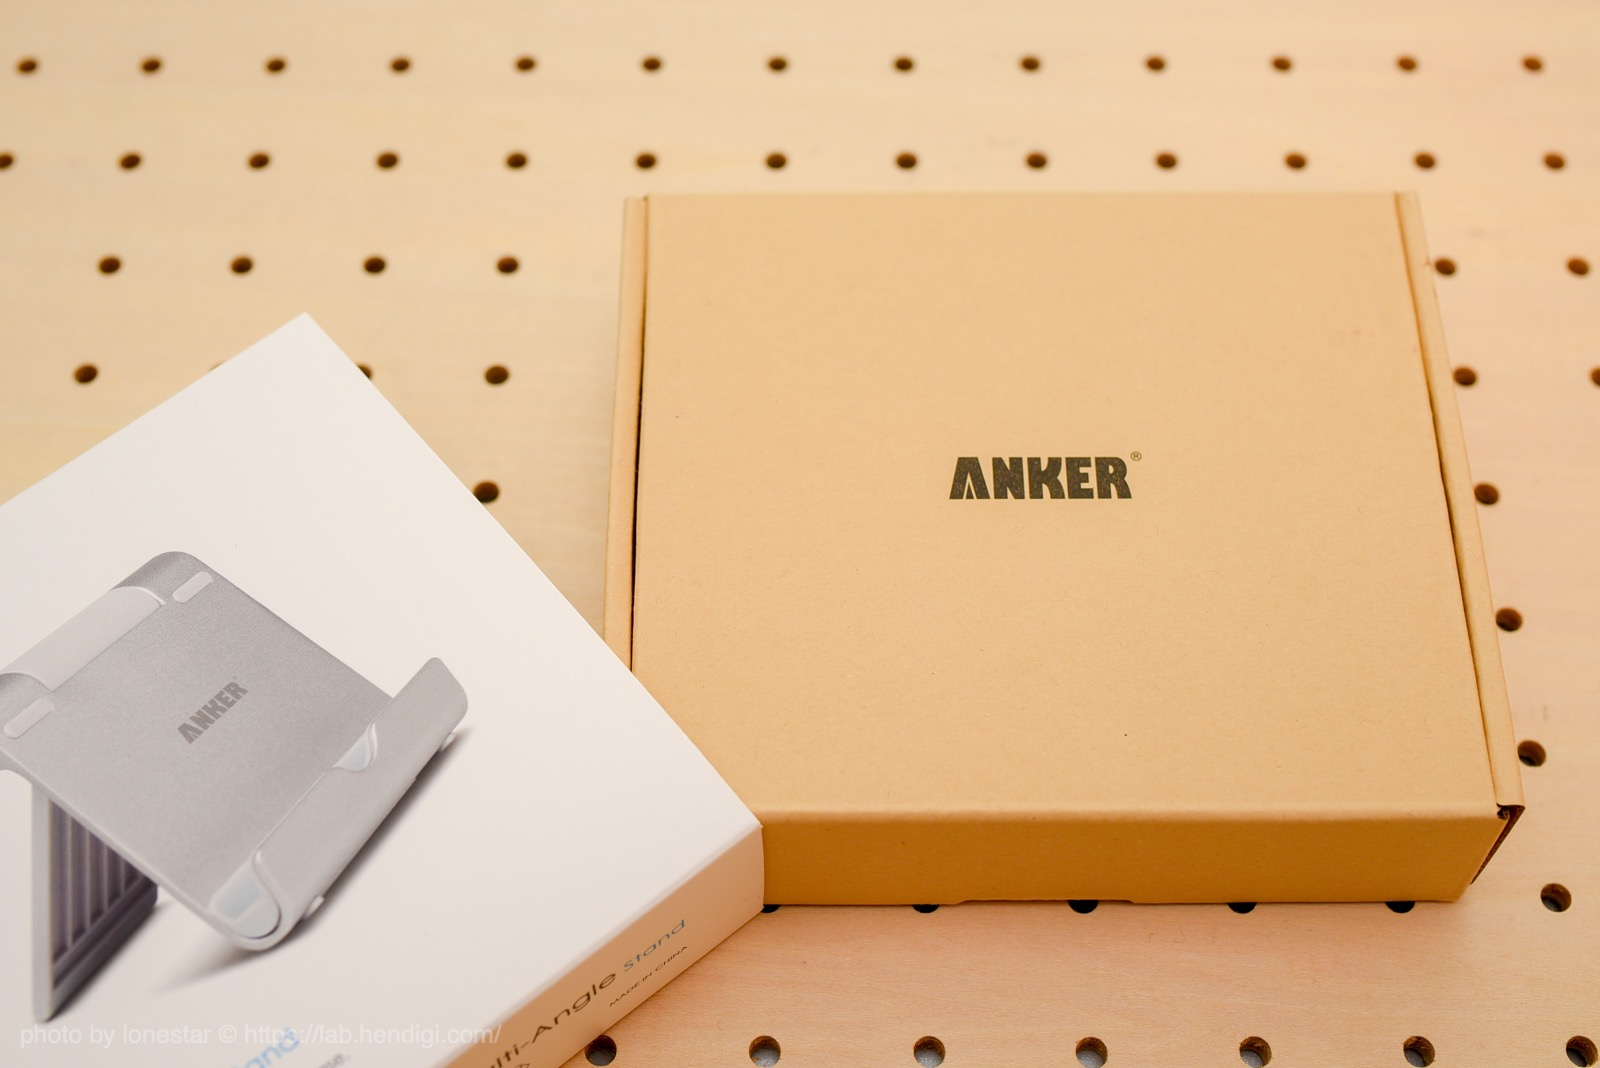 Anker タブレット用スタンド